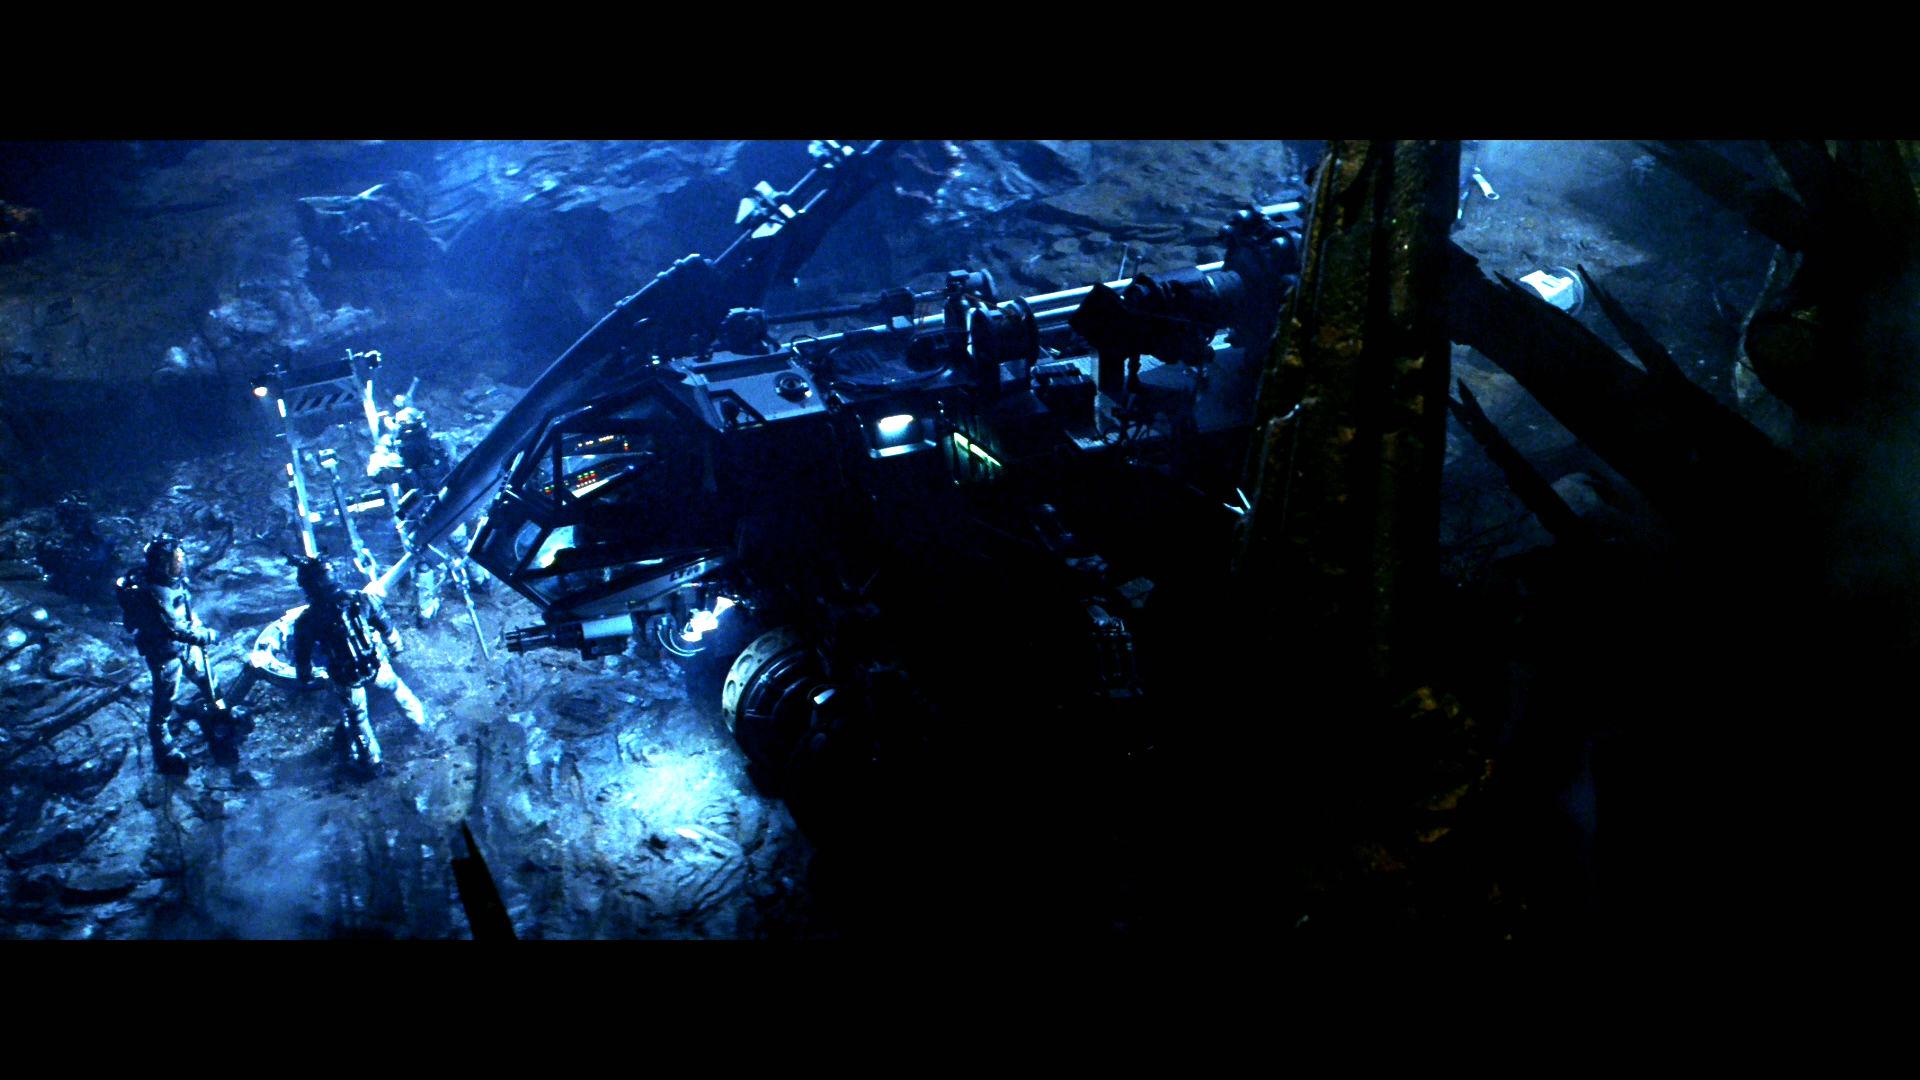 ARMAGEDDON action adventure sci-fi fa wallpaper ...